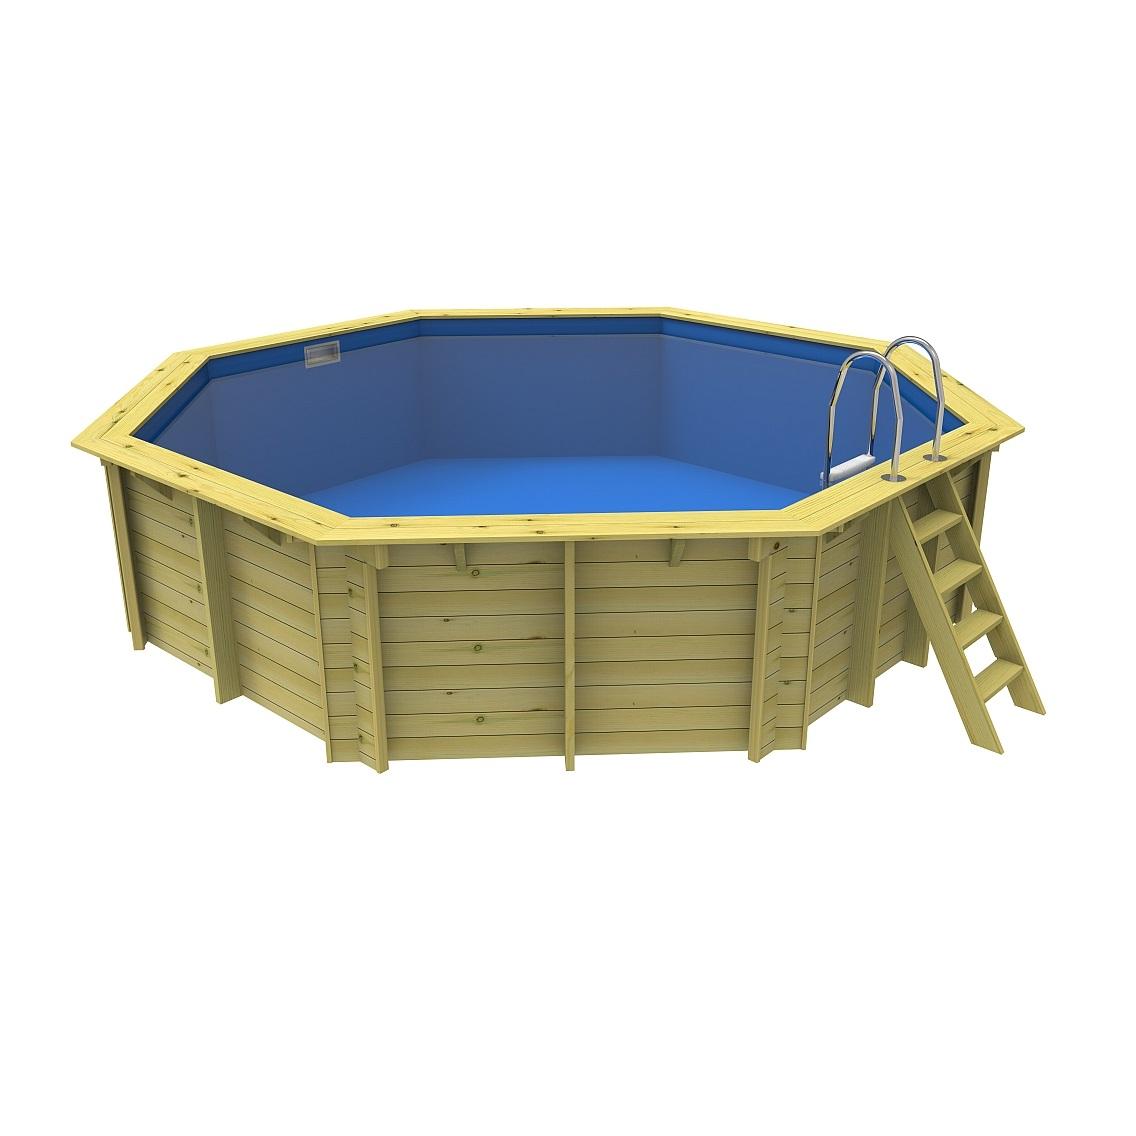 Hồ bơi composite frp khung gỗ 5.7 x 1.35 m